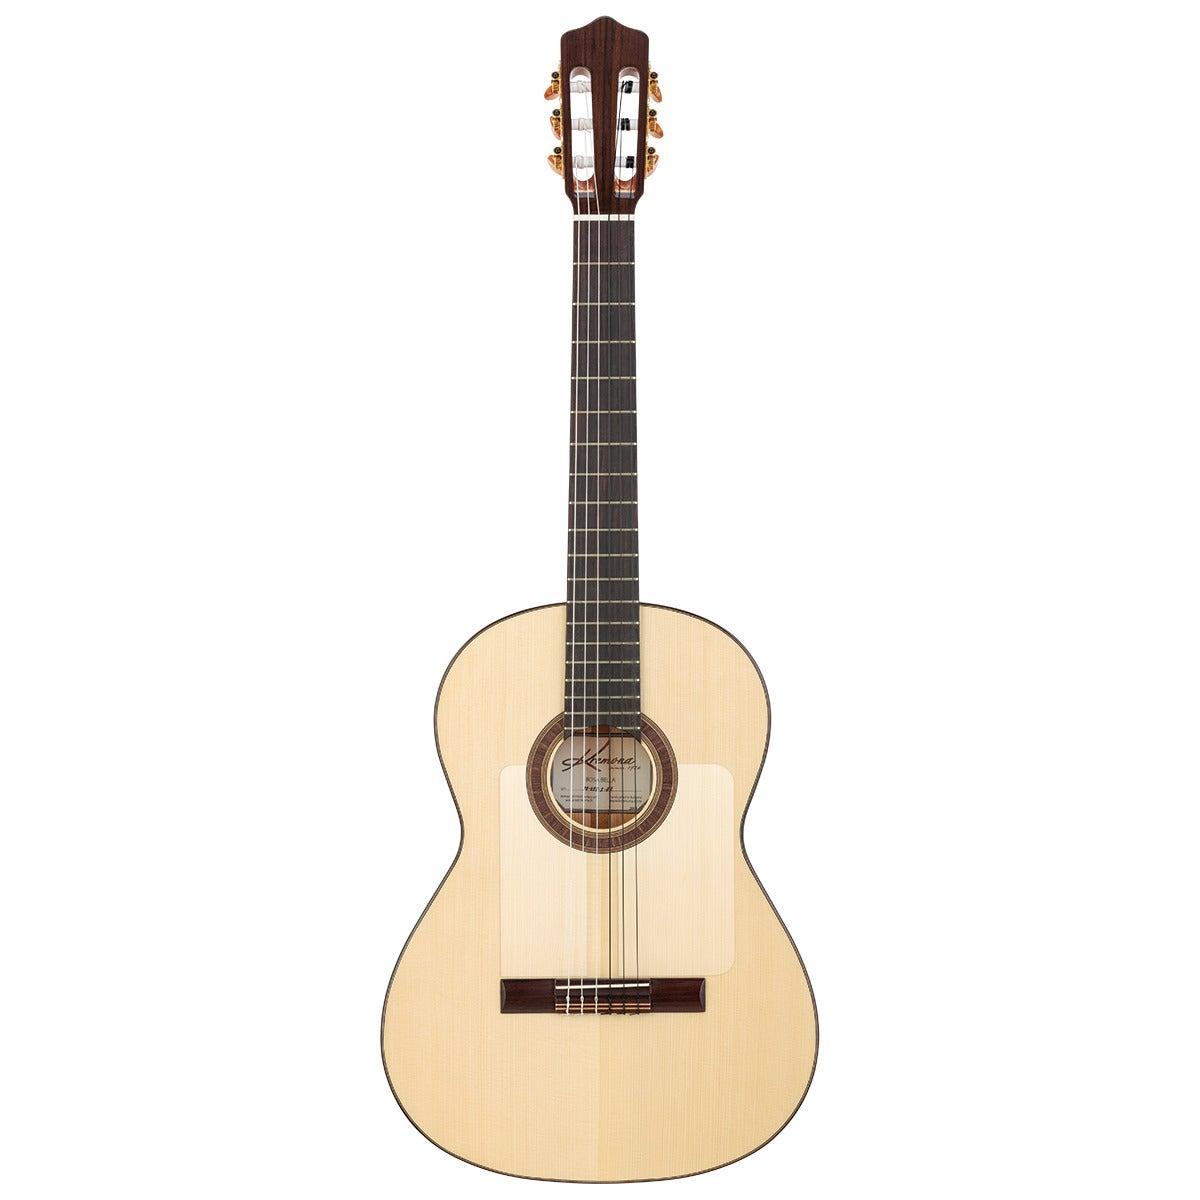 Kremona Rosa Bella All Solid Spruce / Ash Classic Guitar